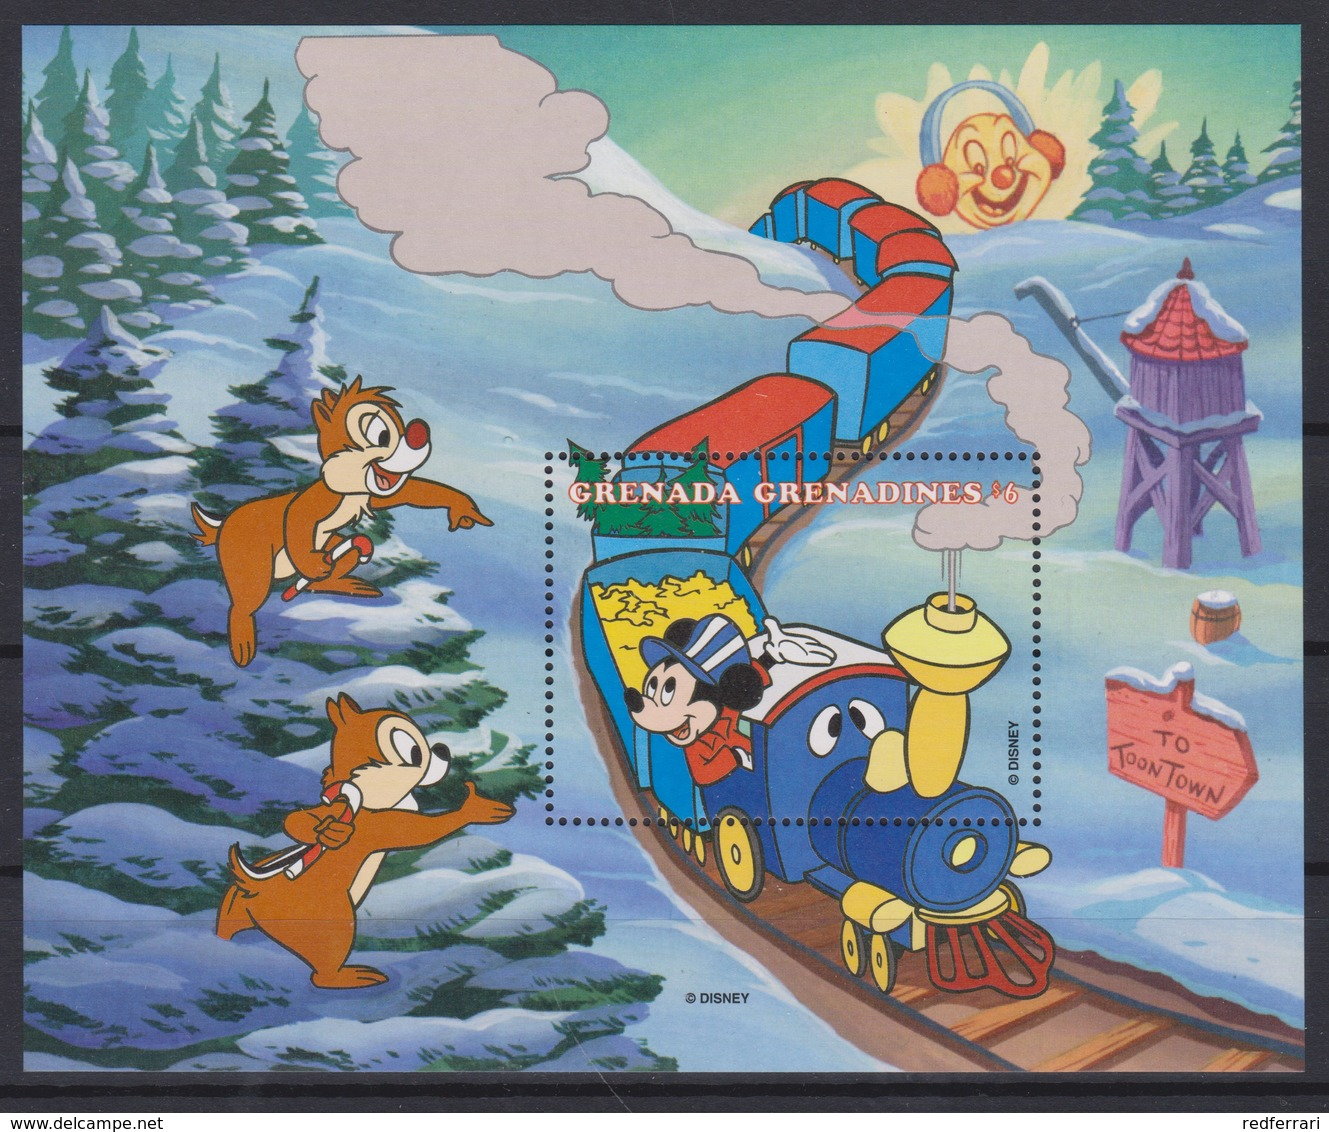 2306   WALT DISNEY   GRENADA GRENADINES  ( 70 Th Aniverseray Of Micey ) The Christmas Train Of Mickey . - Disney